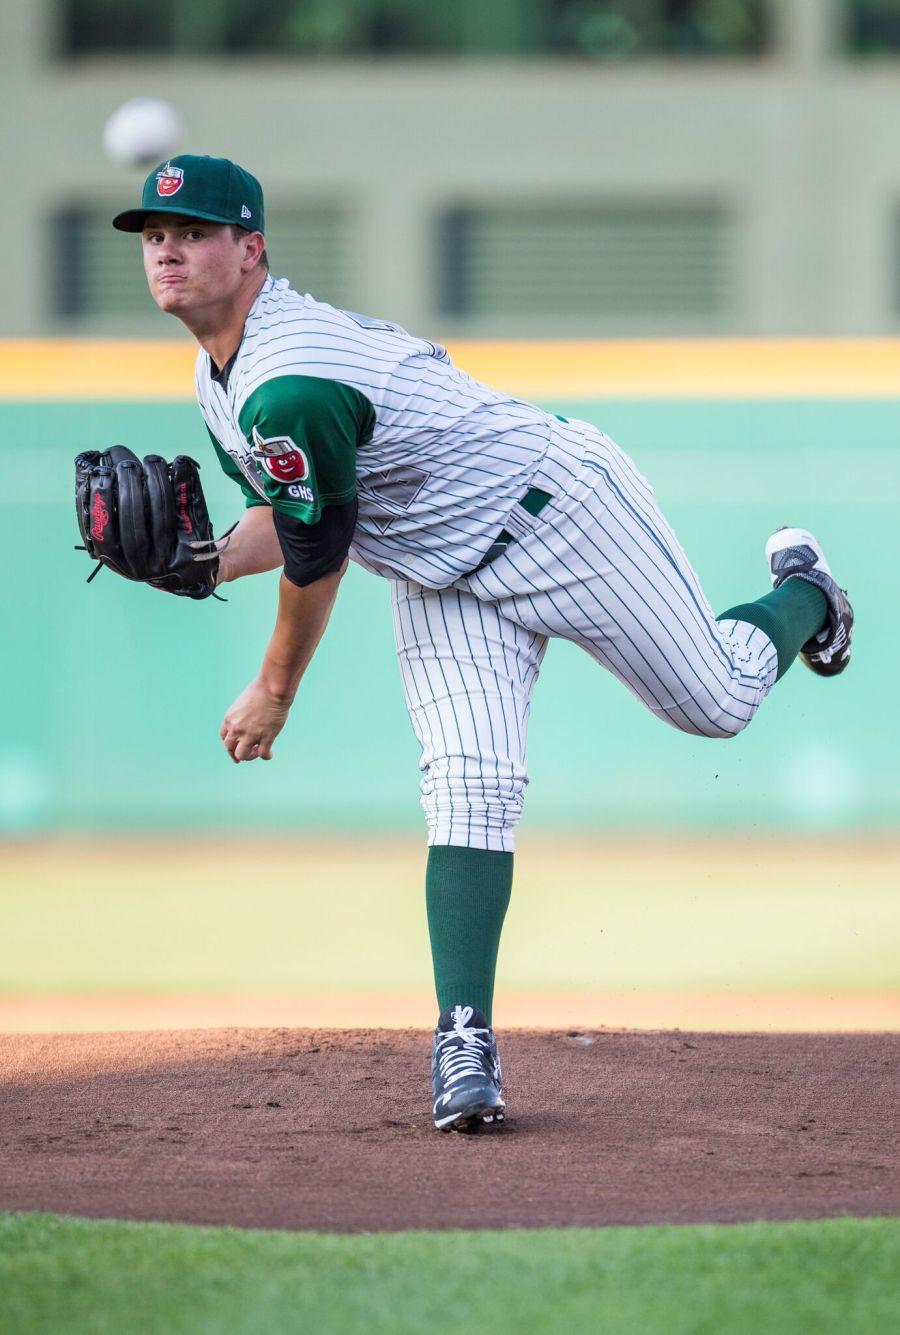 Padres pitching prospect Adrian Morejon